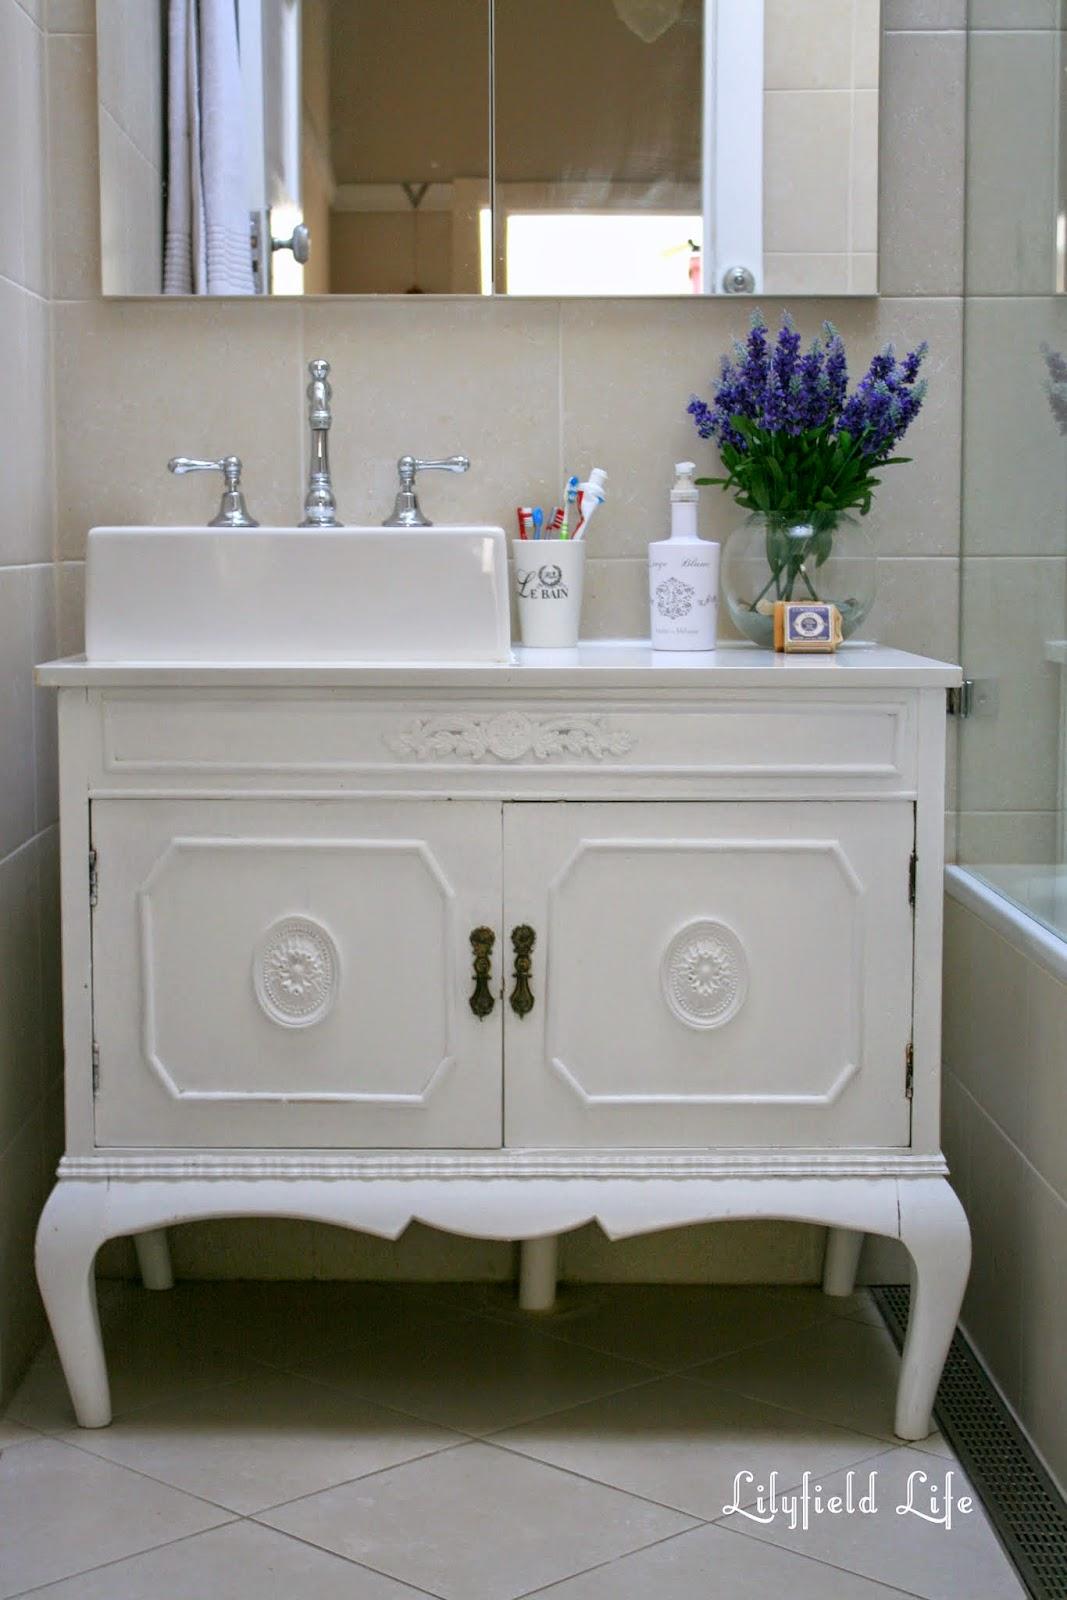 Vintage Cabinet Turned Bathroom Vanity, Vintage Bathroom Vanity